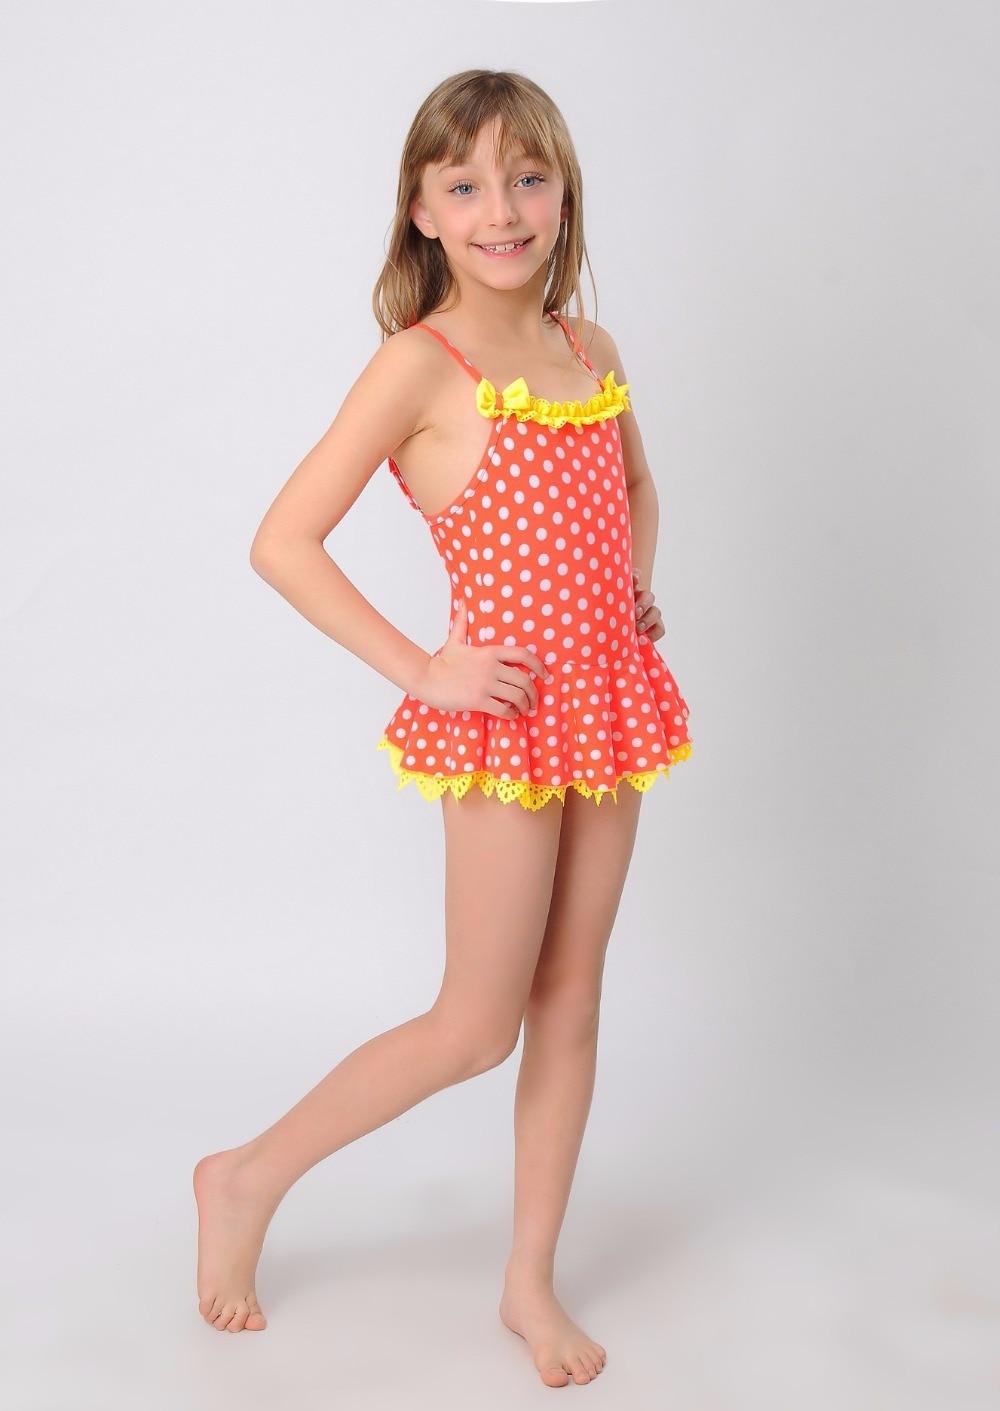 Thong child Aliexpress.com : Buy Dot Enfant Baby Girl Child Summer .